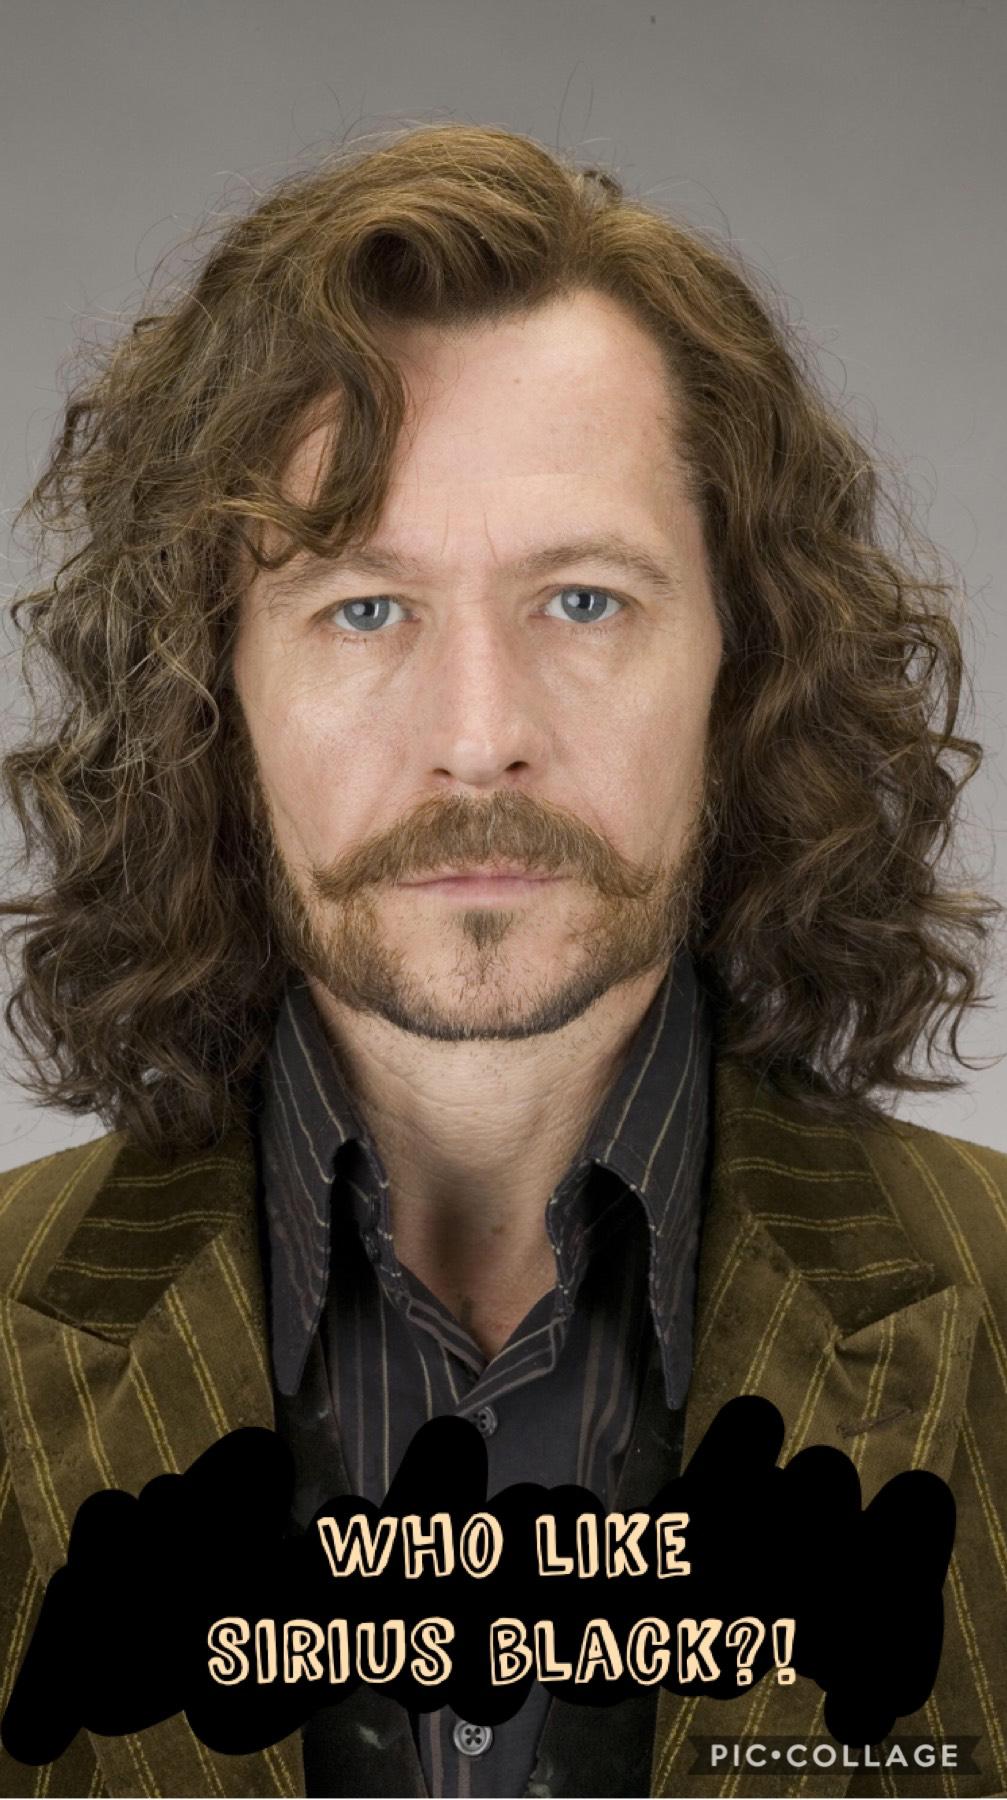 I love Sirius Black!!!❤️😂😘😘